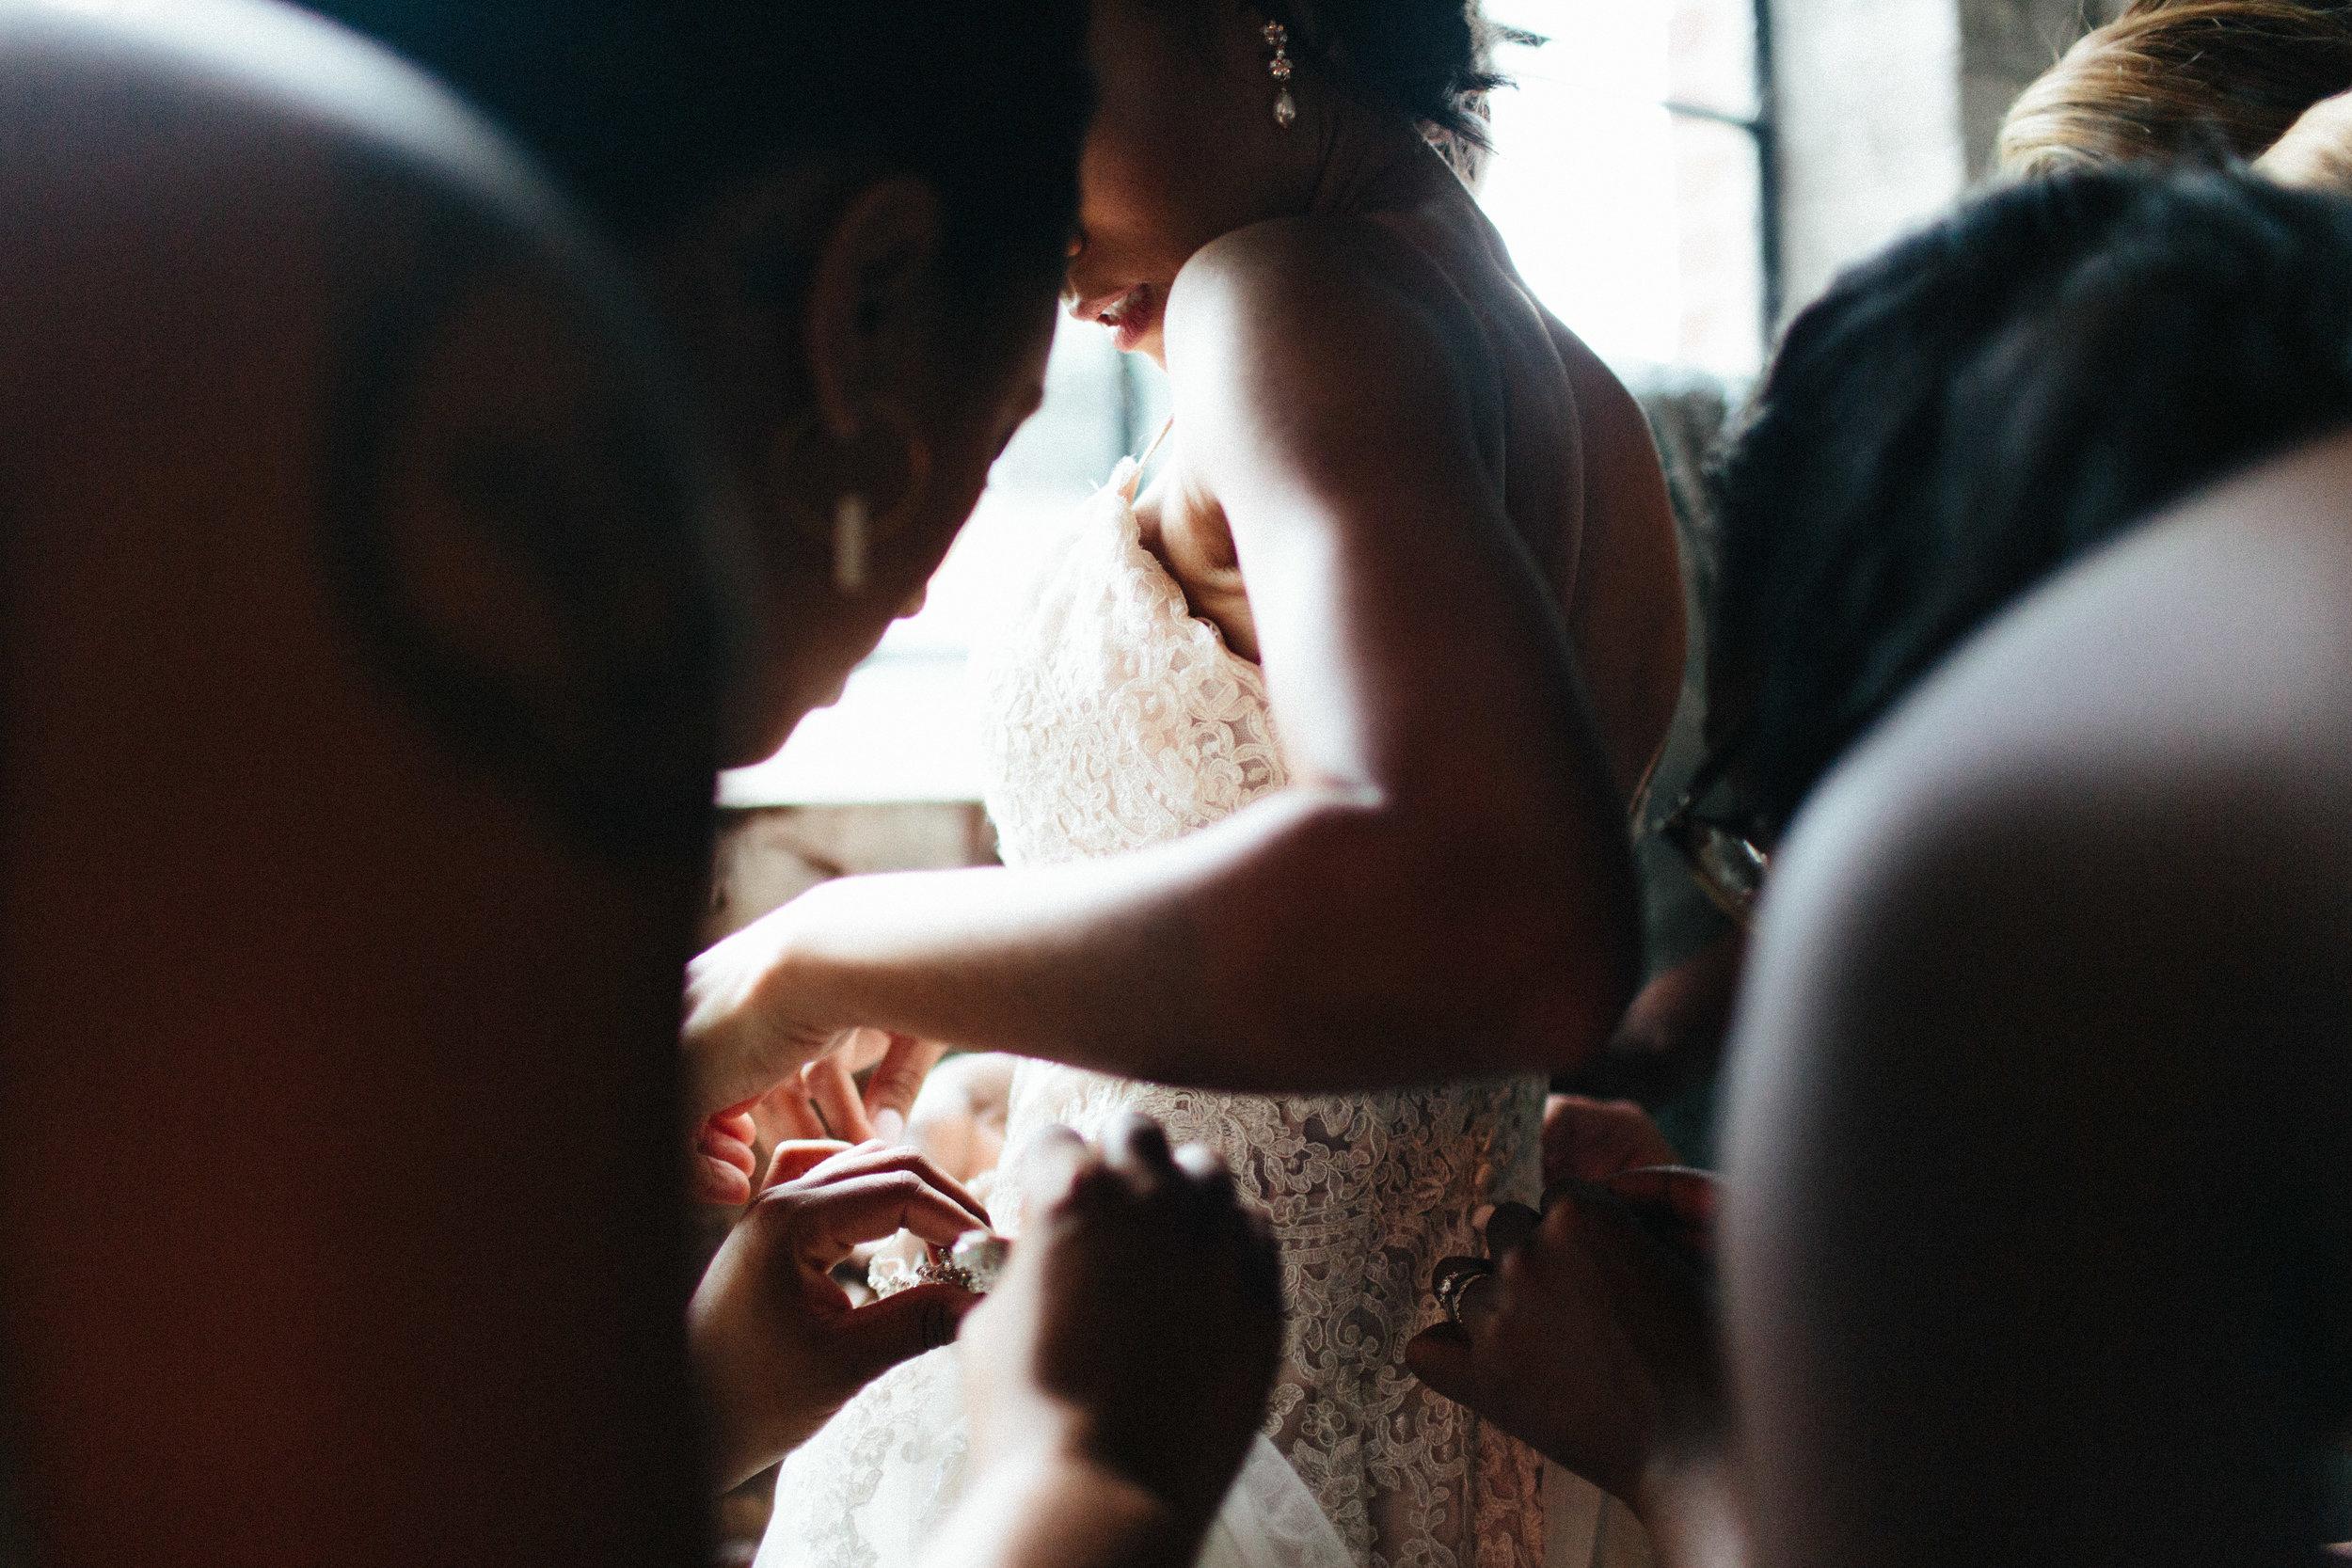 king_plow_atlanta_wedding_art_gallery_modern_lifestyle_documentary_1136.jpg